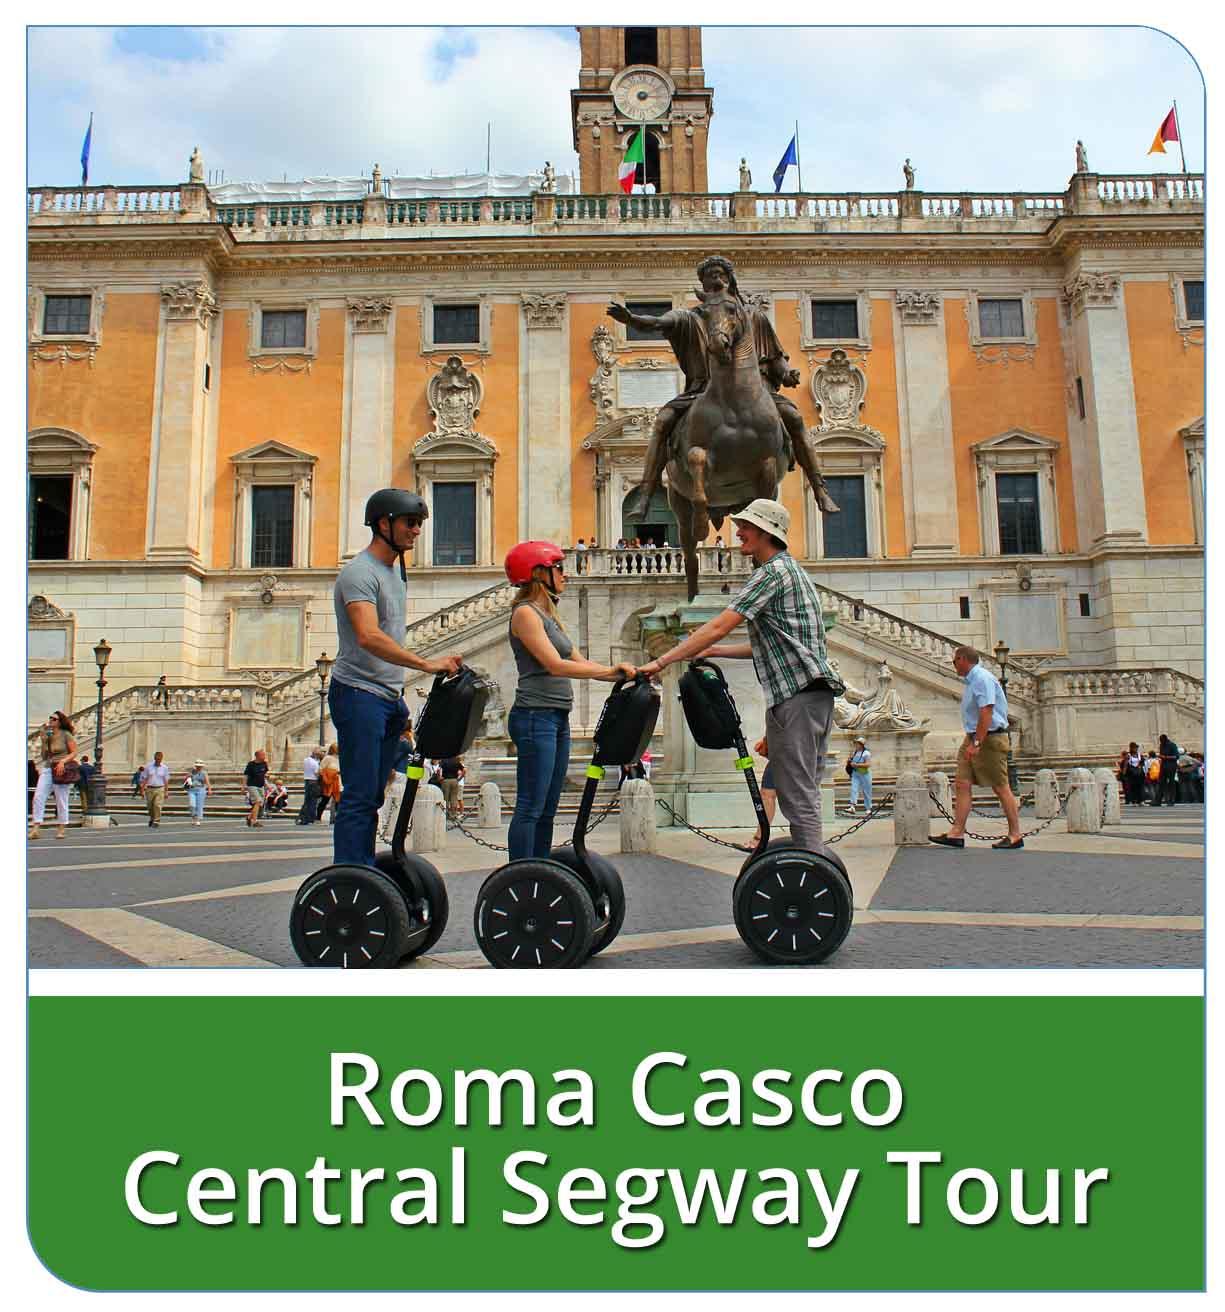 Roma Casco Central Segway Tour